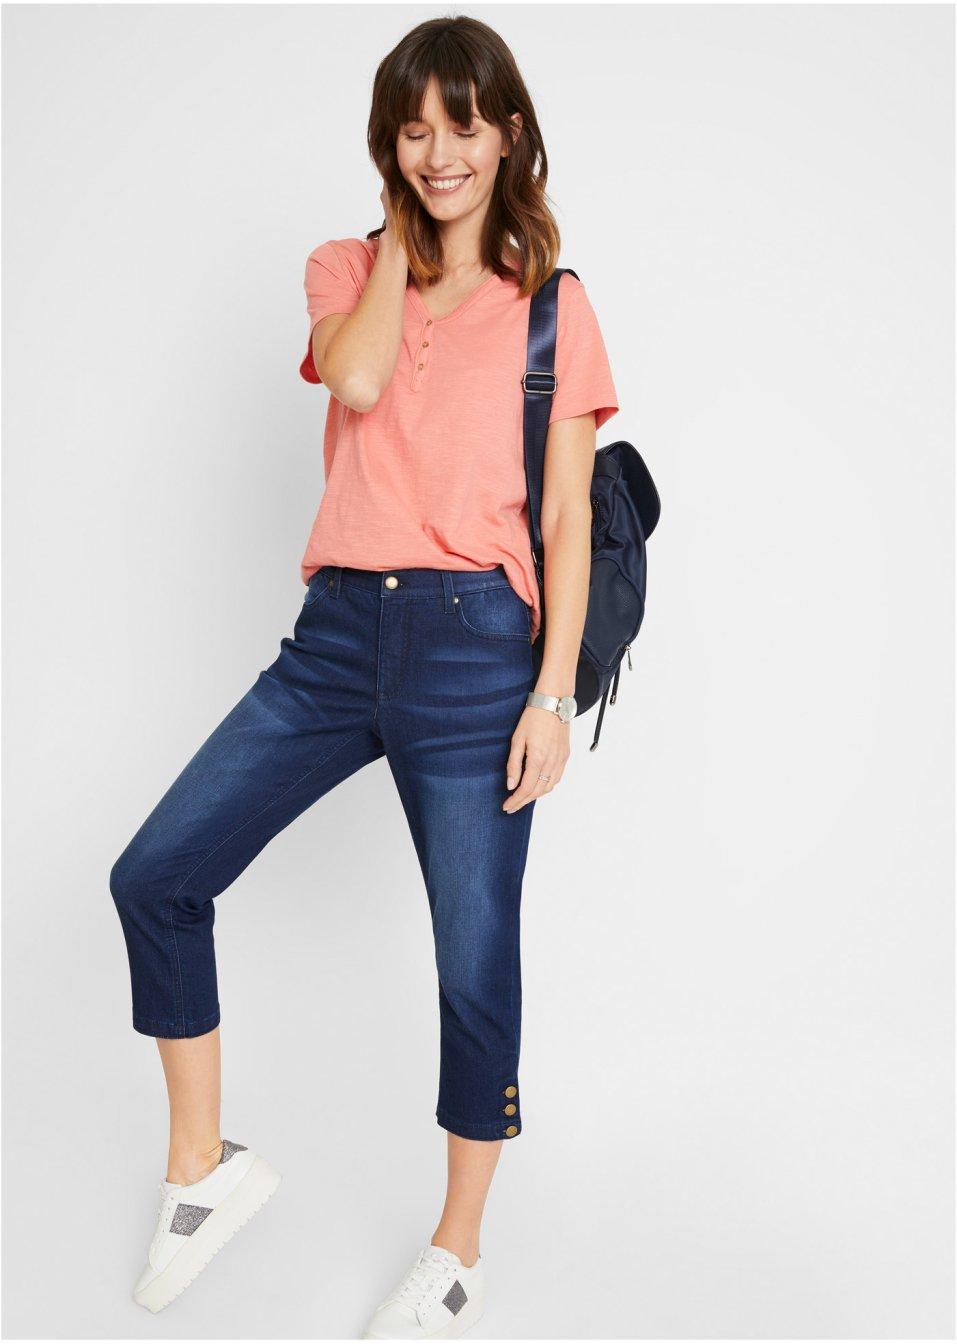 Mode Femme Vêtements DJLfdOFlkj Jean 3/4 durable, polyester recyclé dark denim used bpc  collection commande online .fr